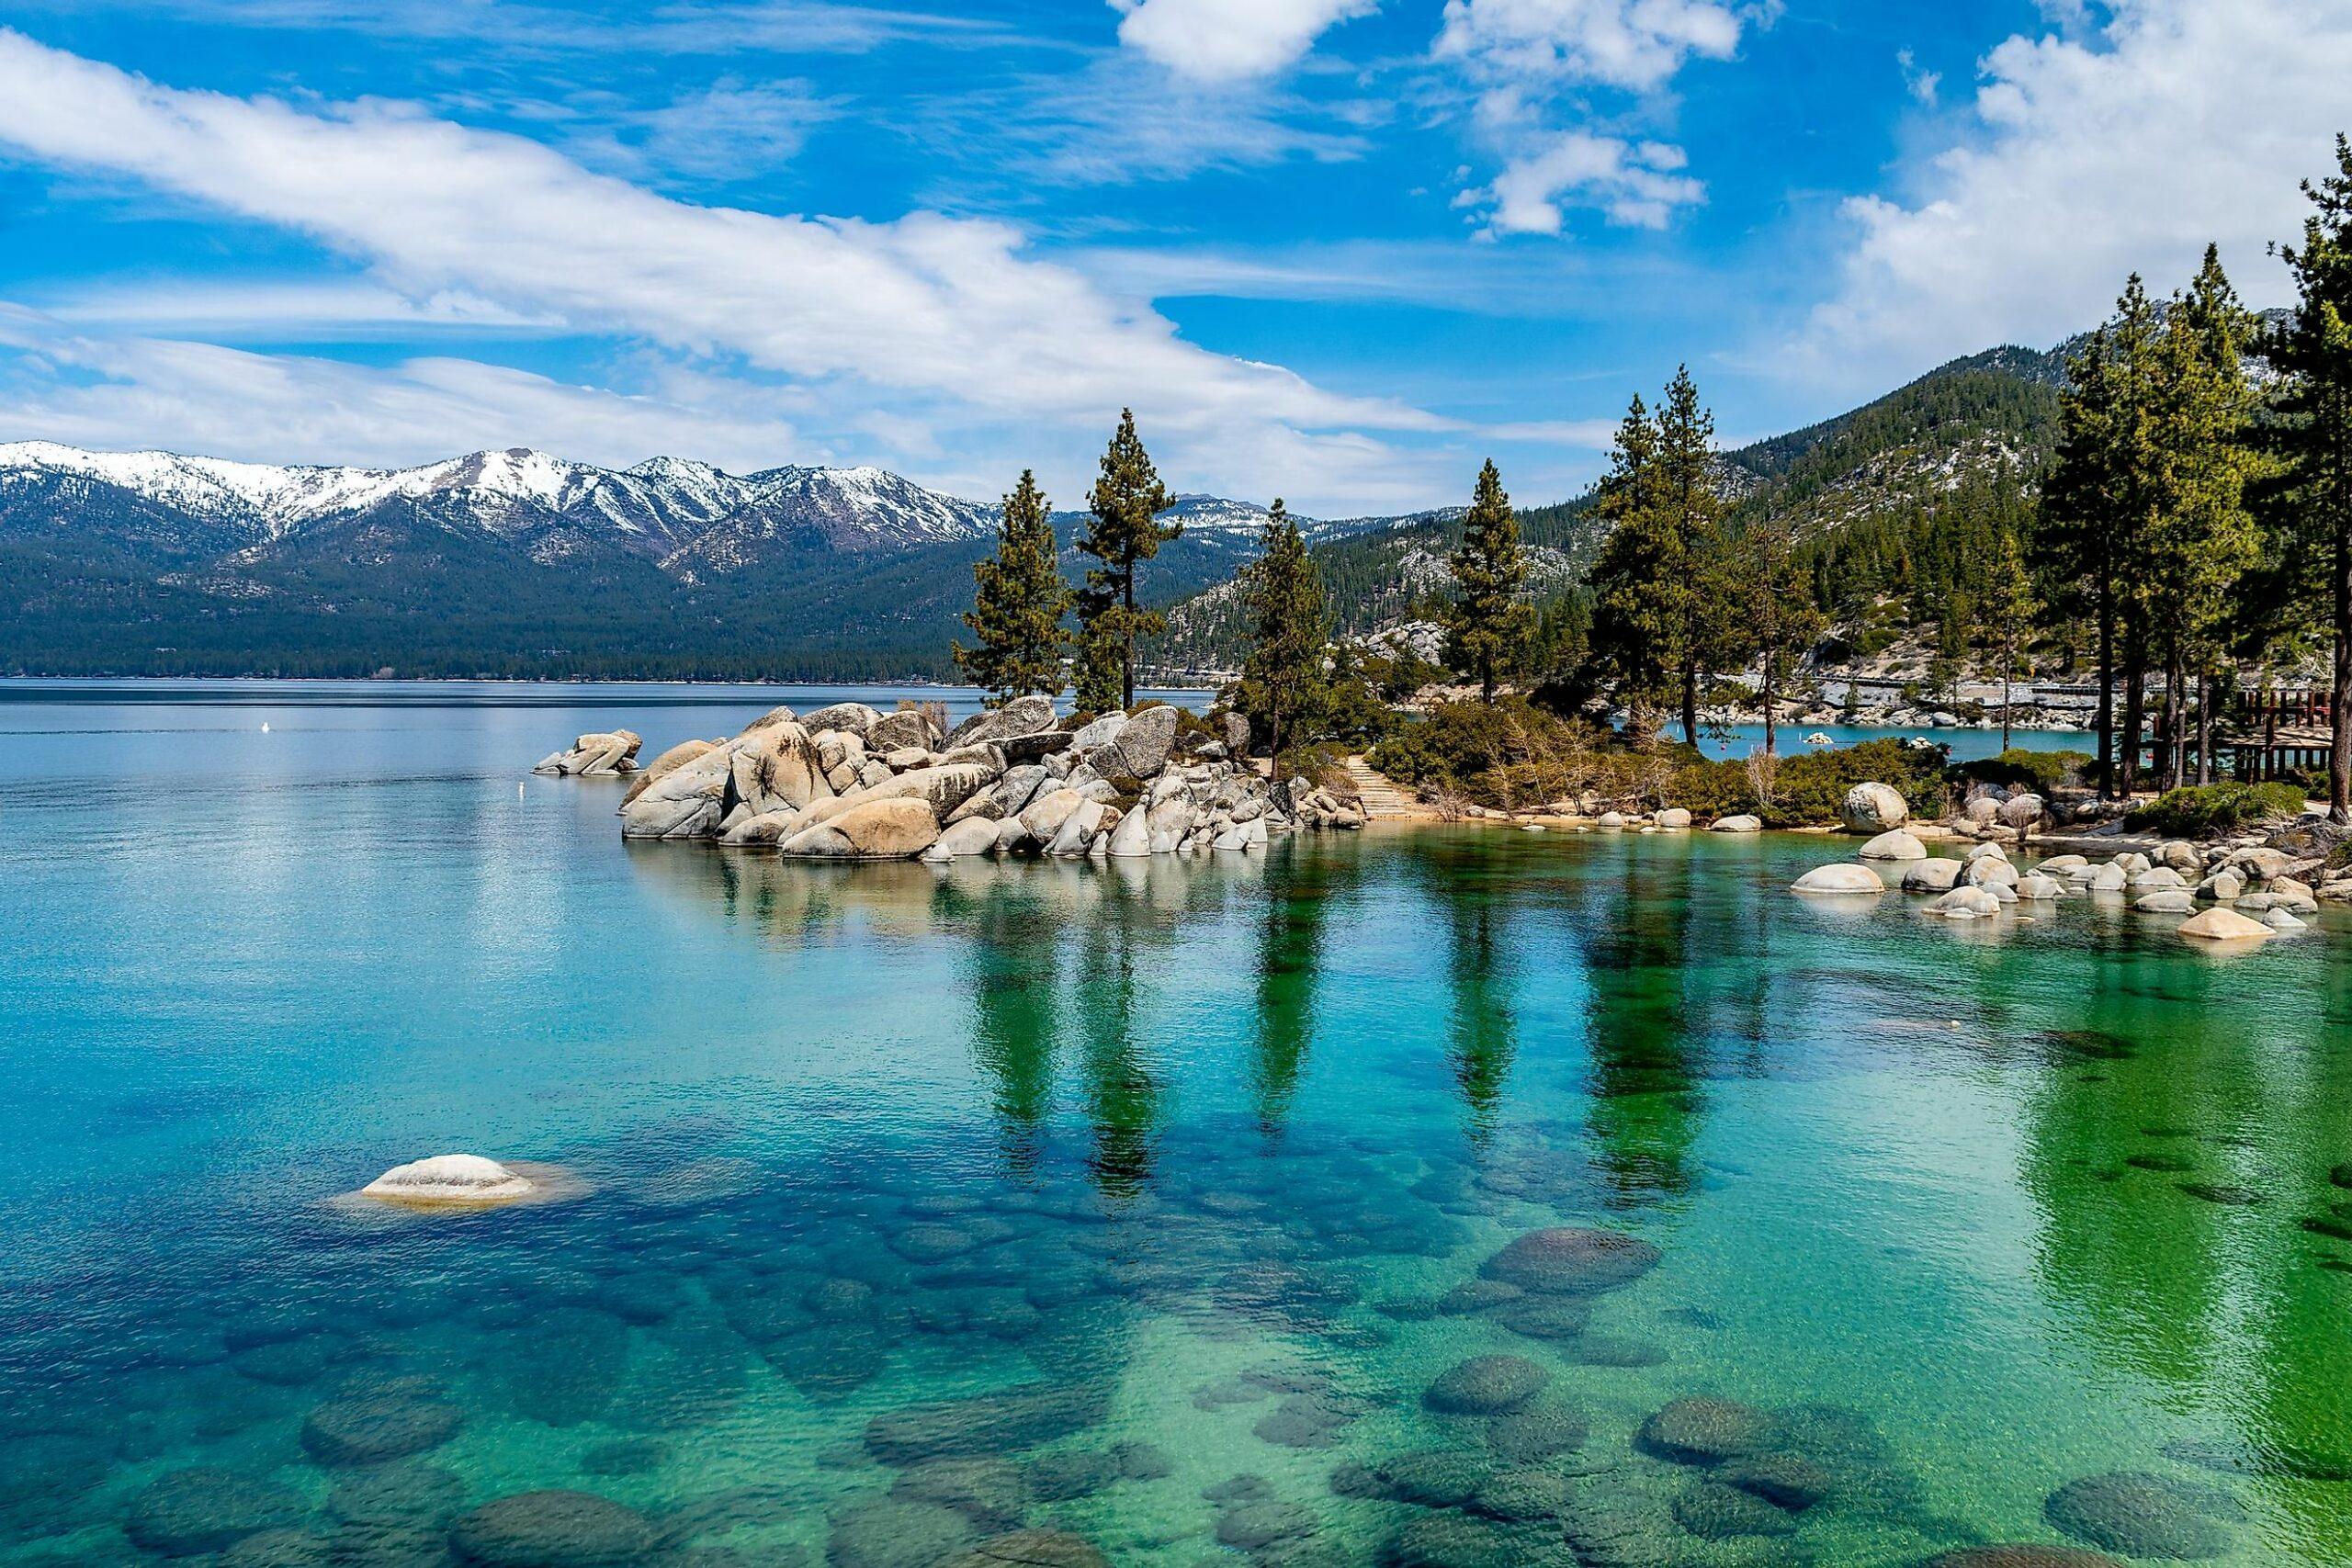 lake-tahoe-california-nevada-us